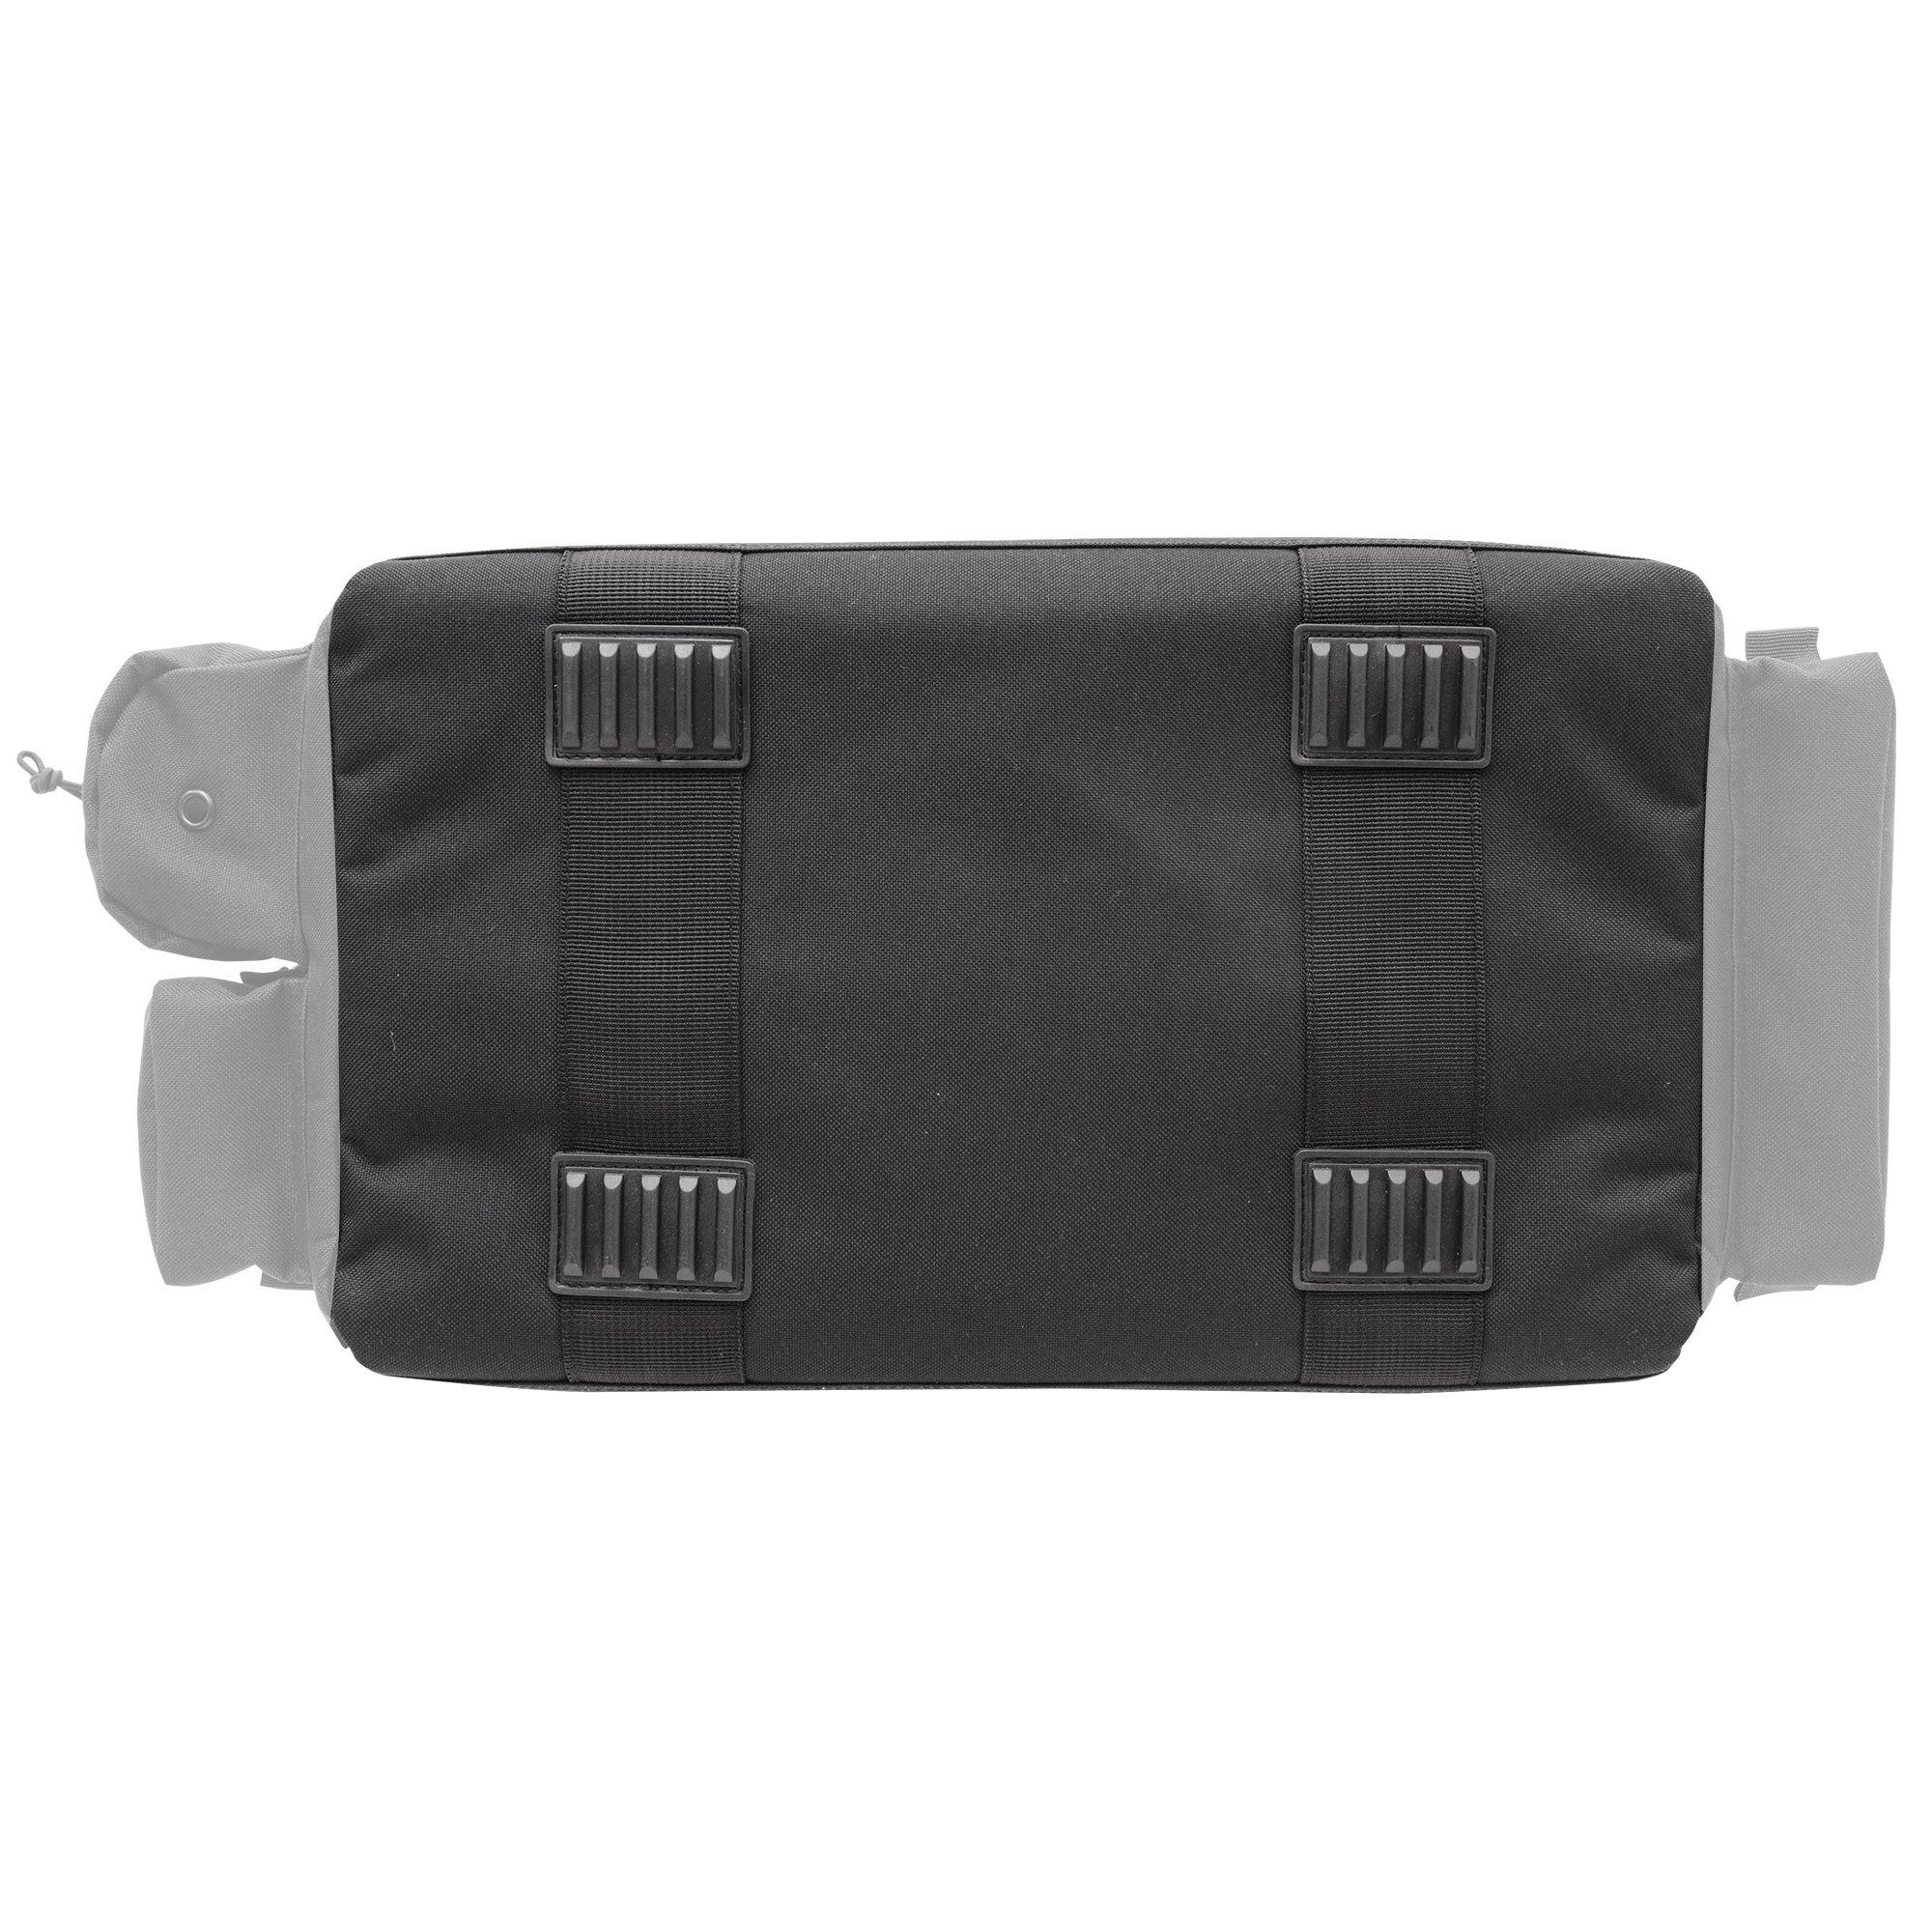 UTG All in One Range/Utility Go Bag, Black/Violet, 21'' x 10'' x 9'' by UTG (Image #13)